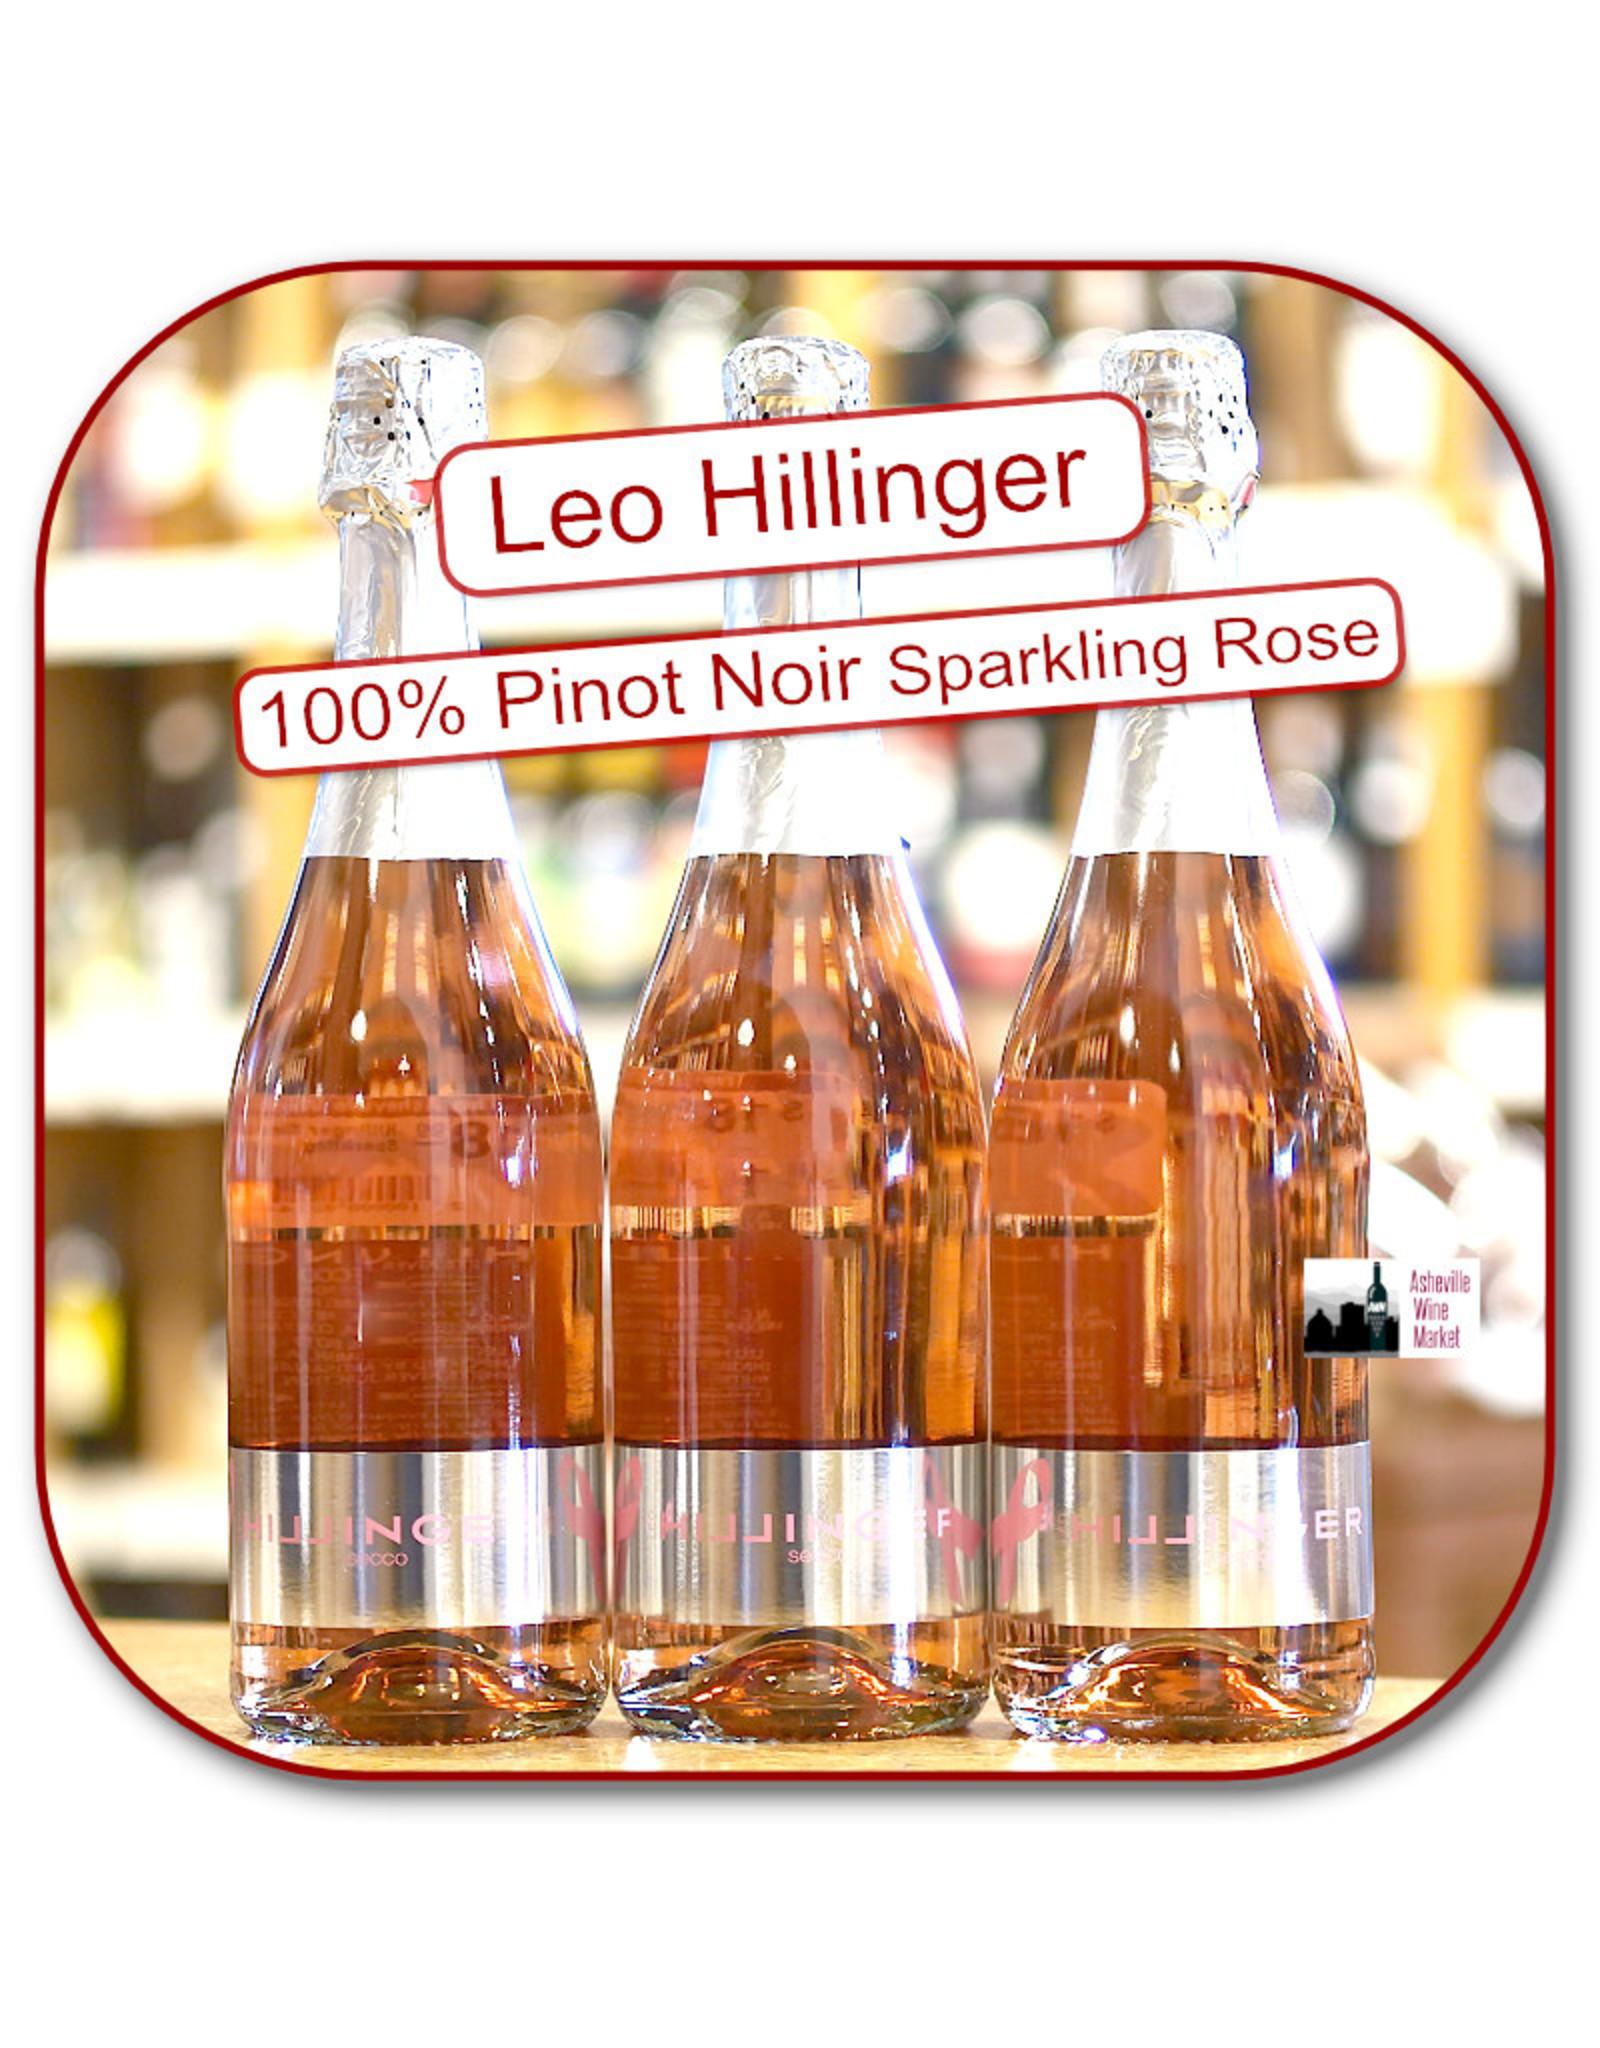 Sparkling Sekt-Secco Hillinger Secco  Sparkling Pinot Noir Rosé